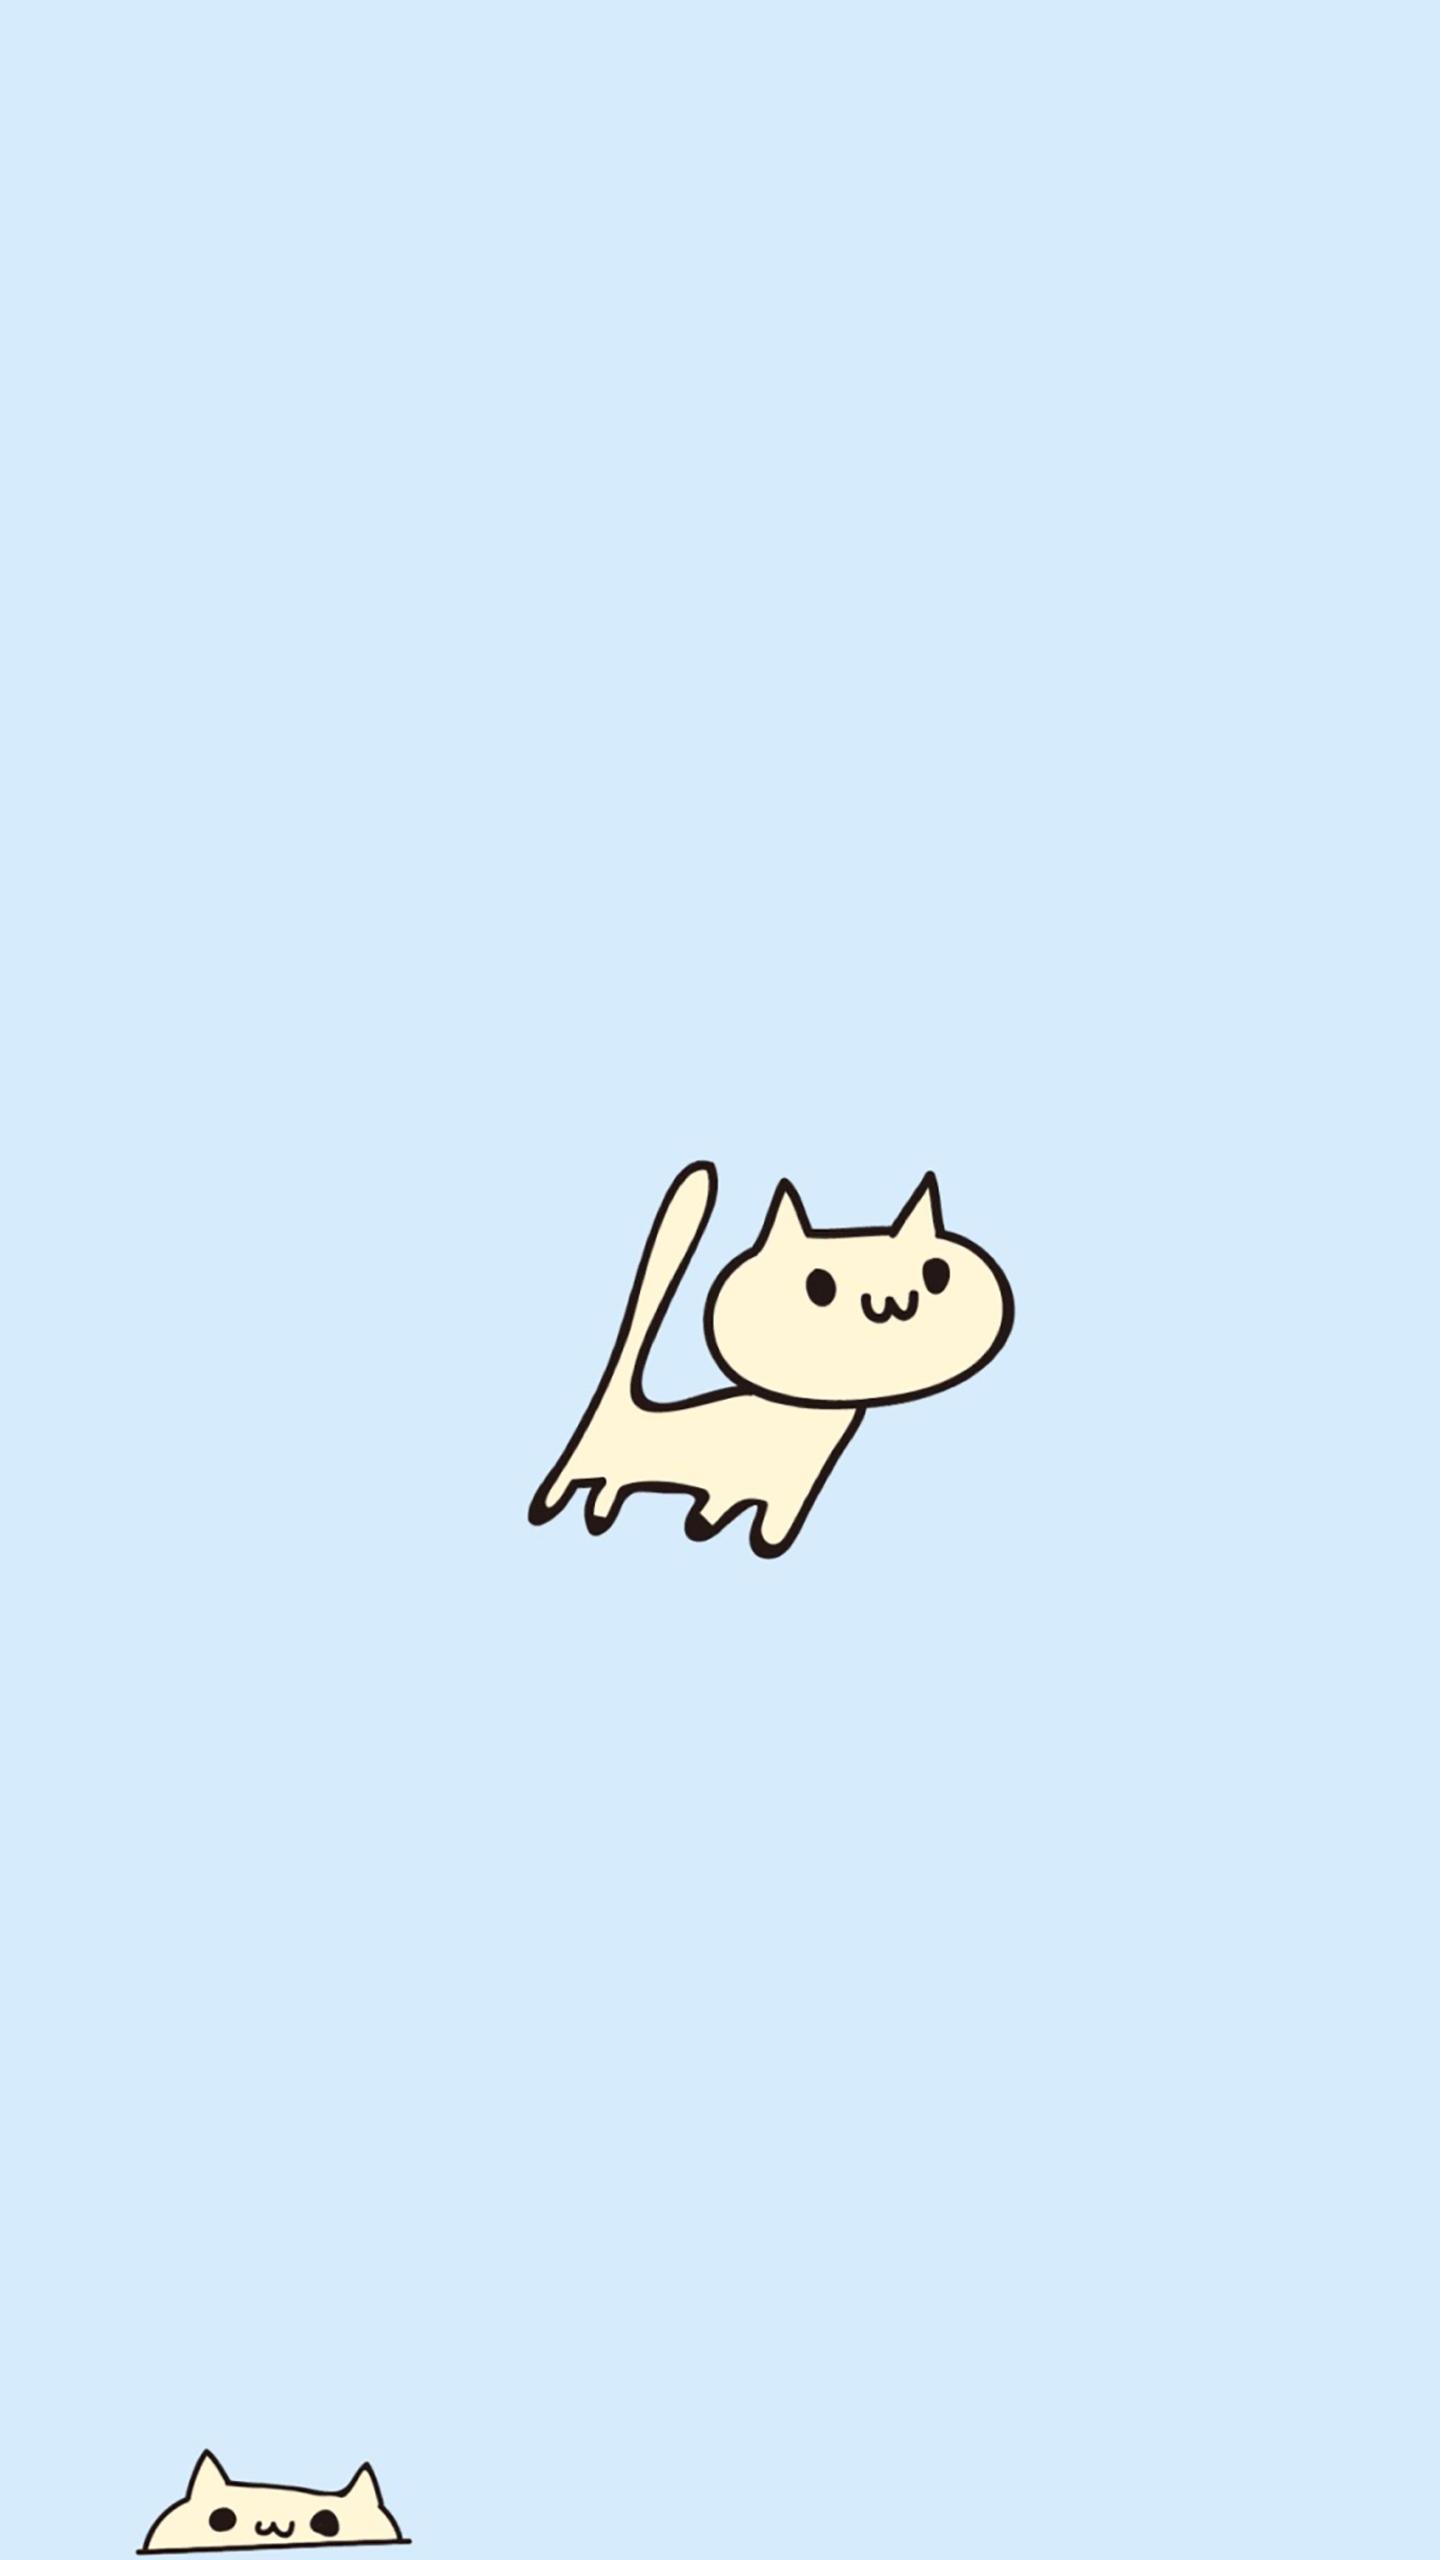 【v粉壁纸】两只可爱小猫